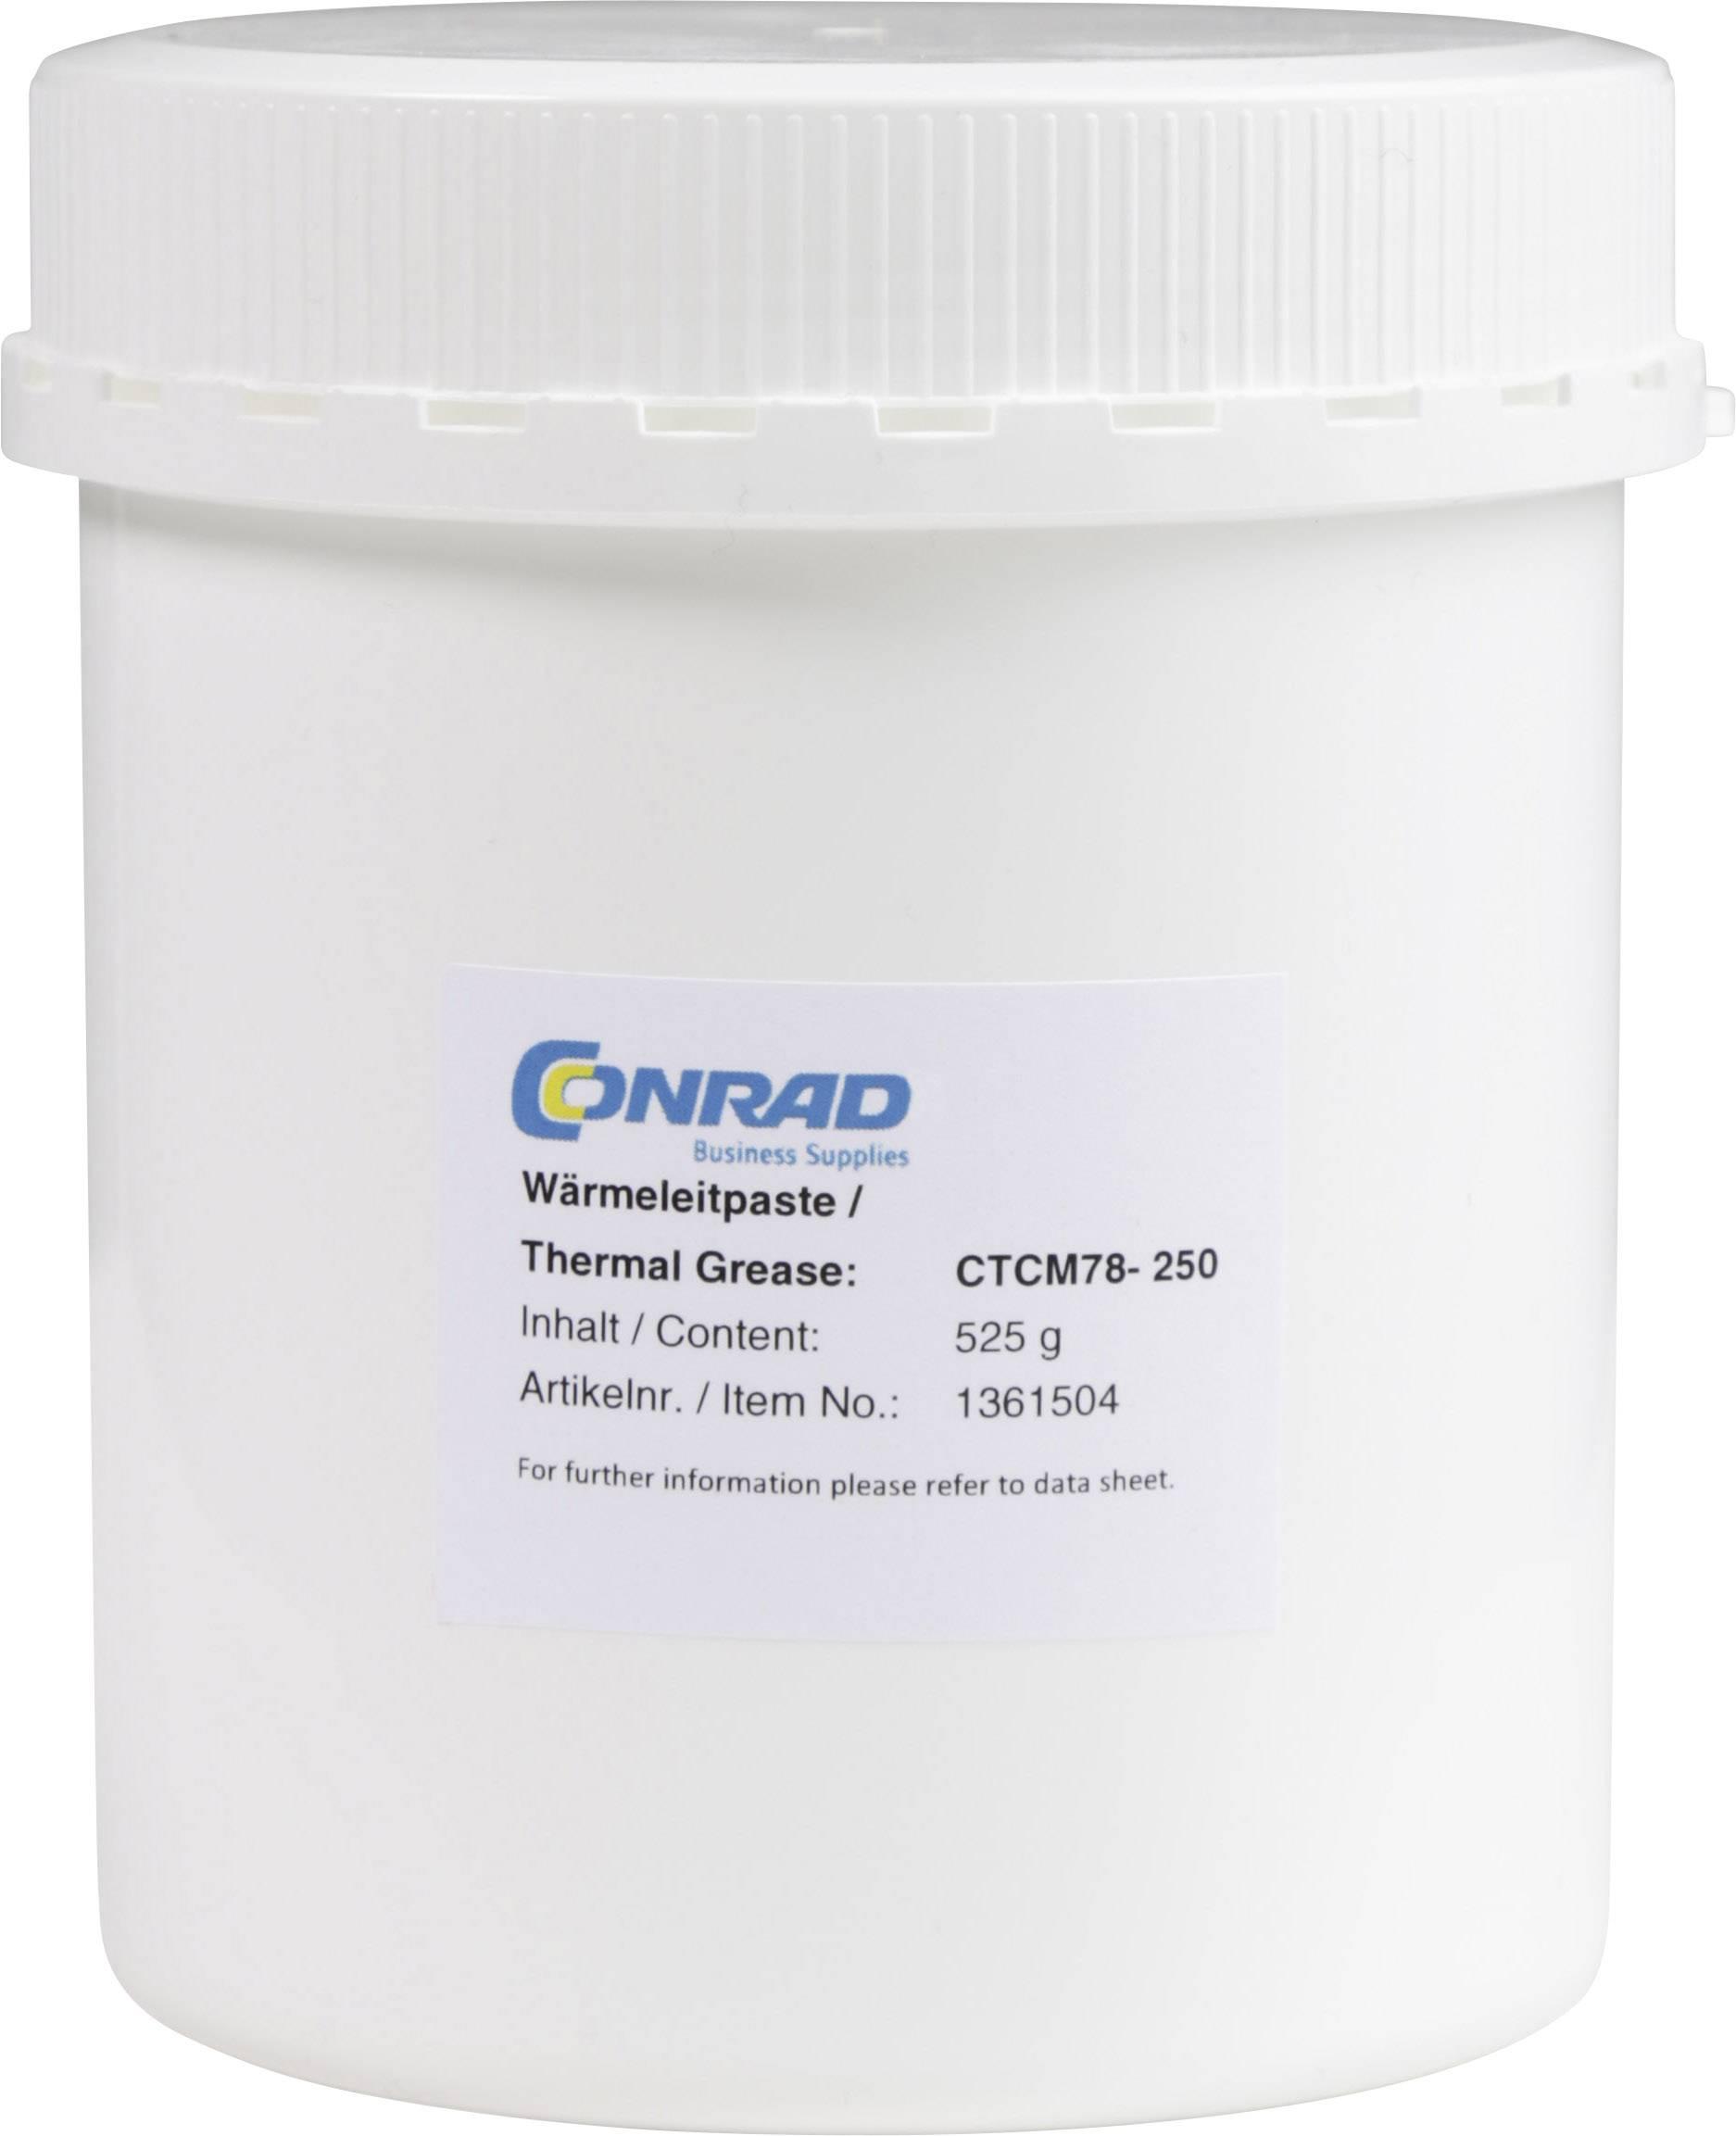 Teplovodivá pasta Conrad CTCM78-250, 7,8 W/mK, 525 g